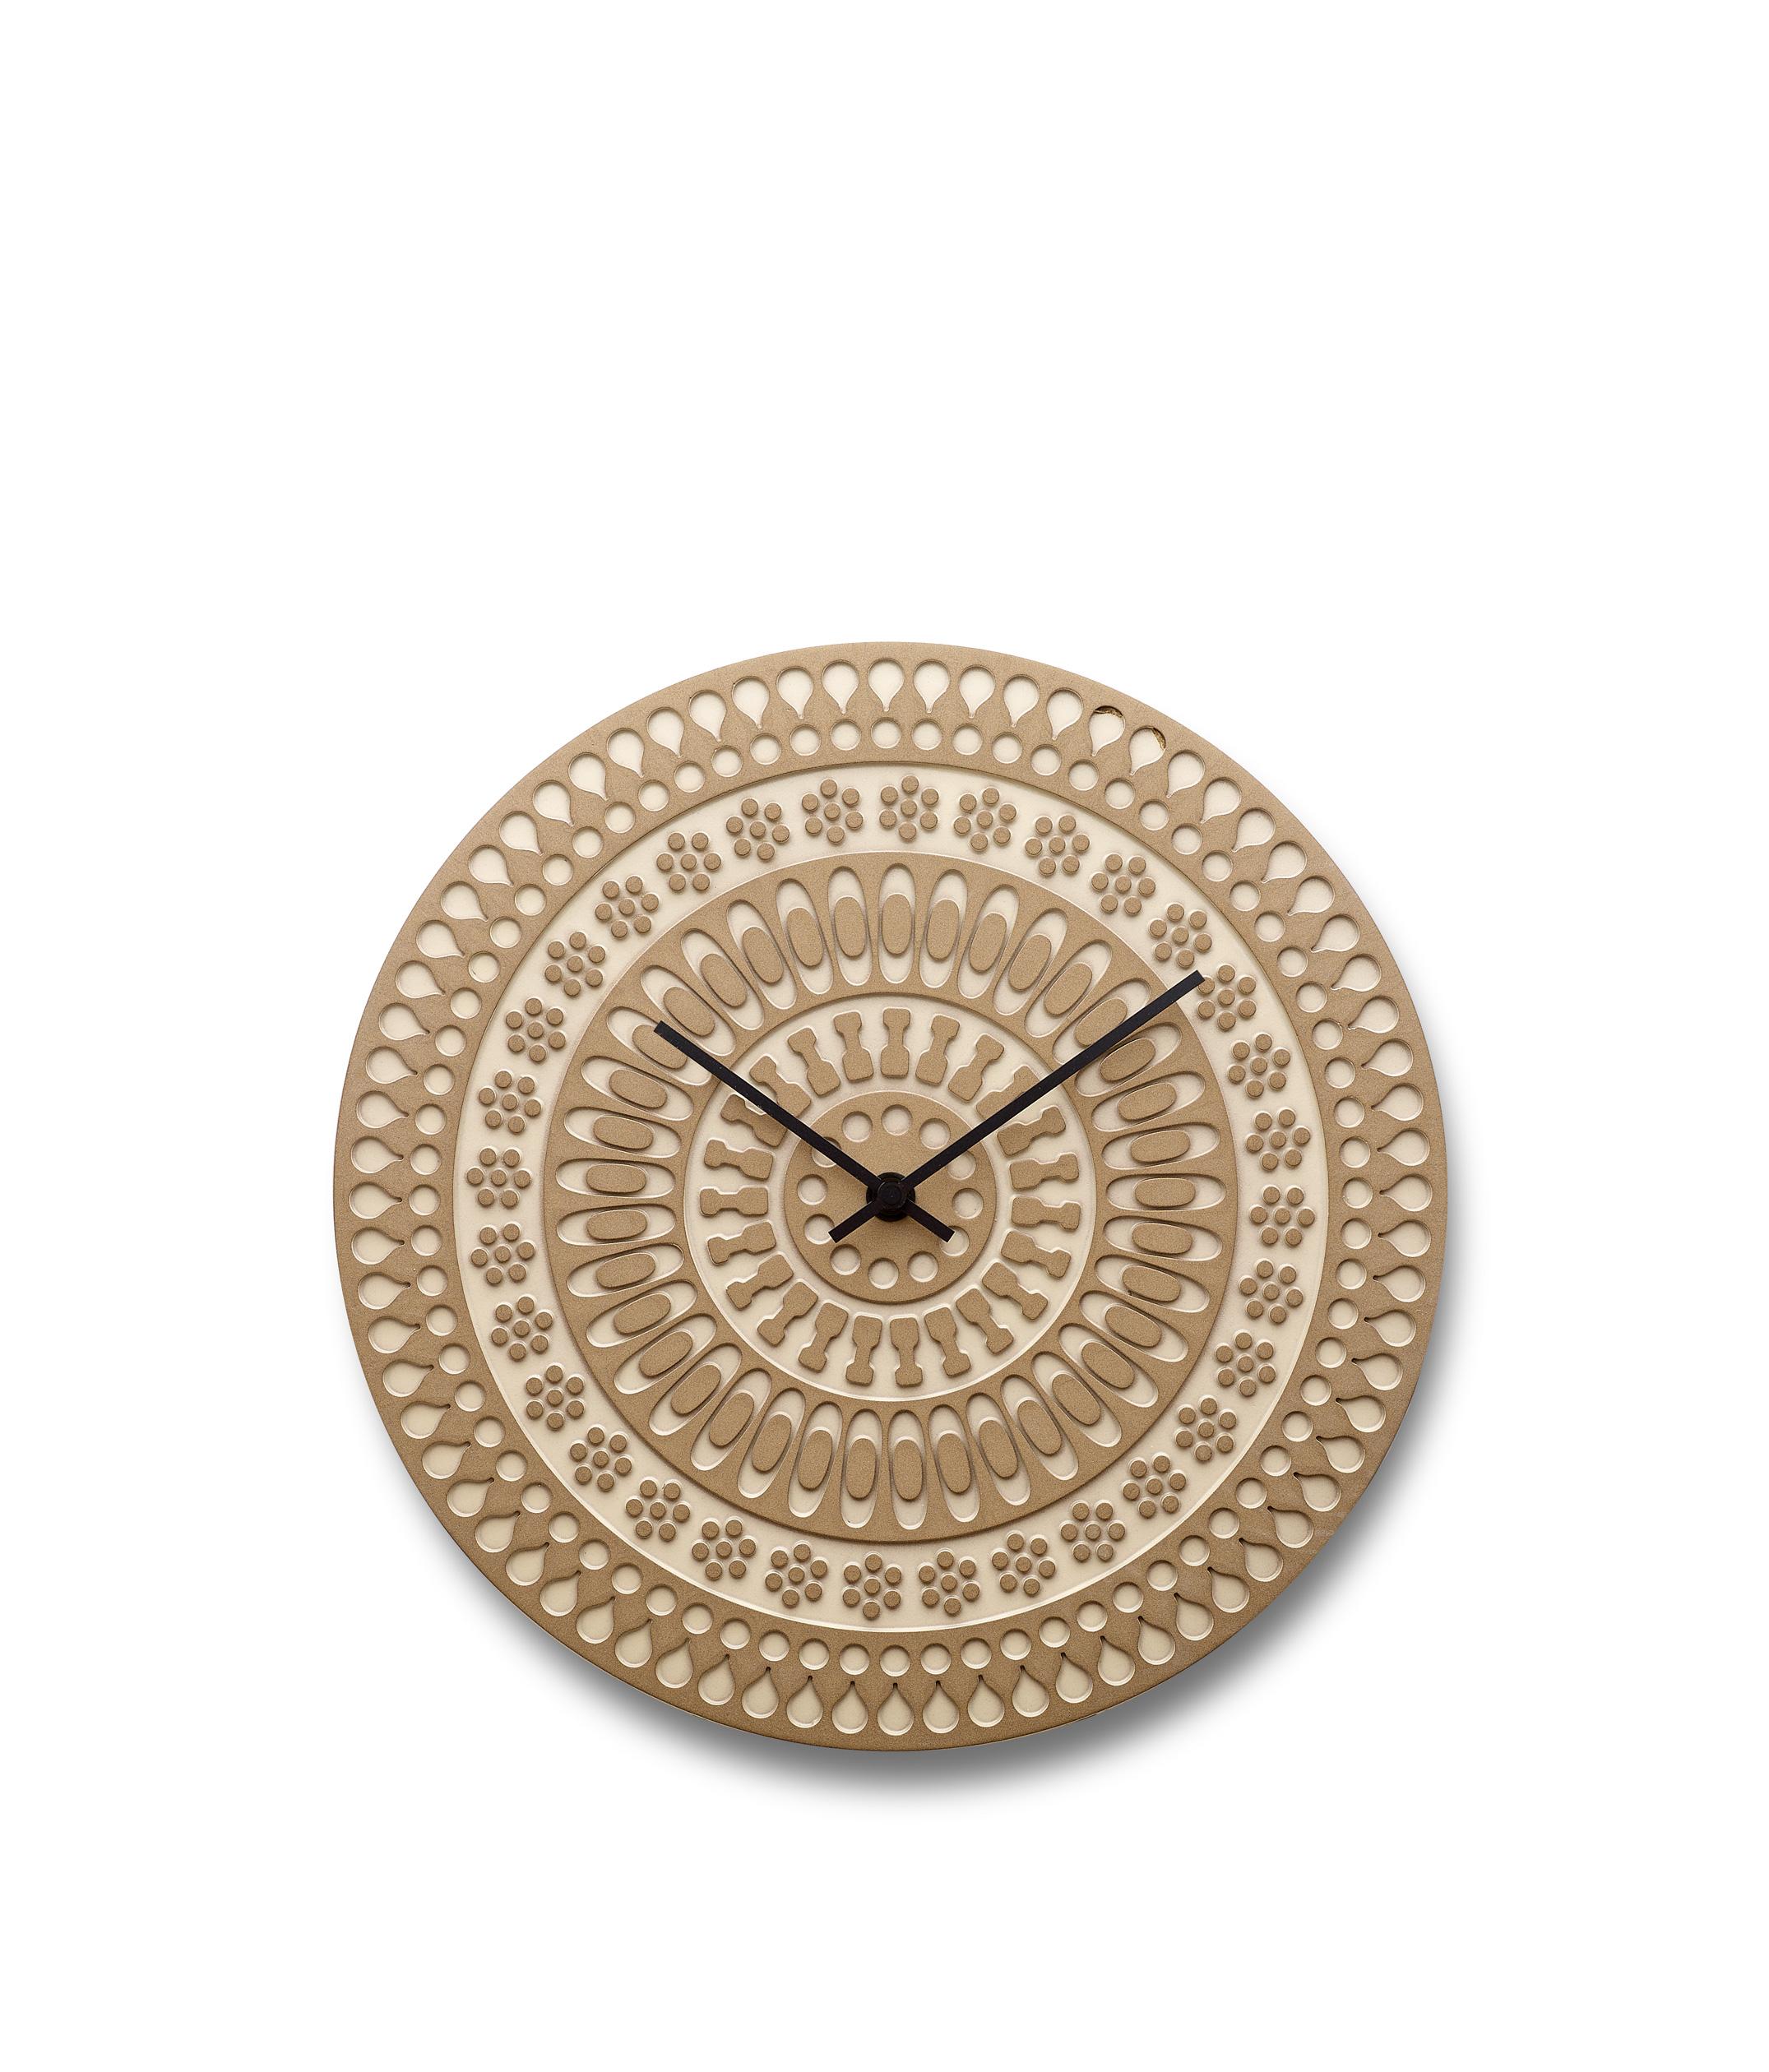 Clocks - Heath Ceramics